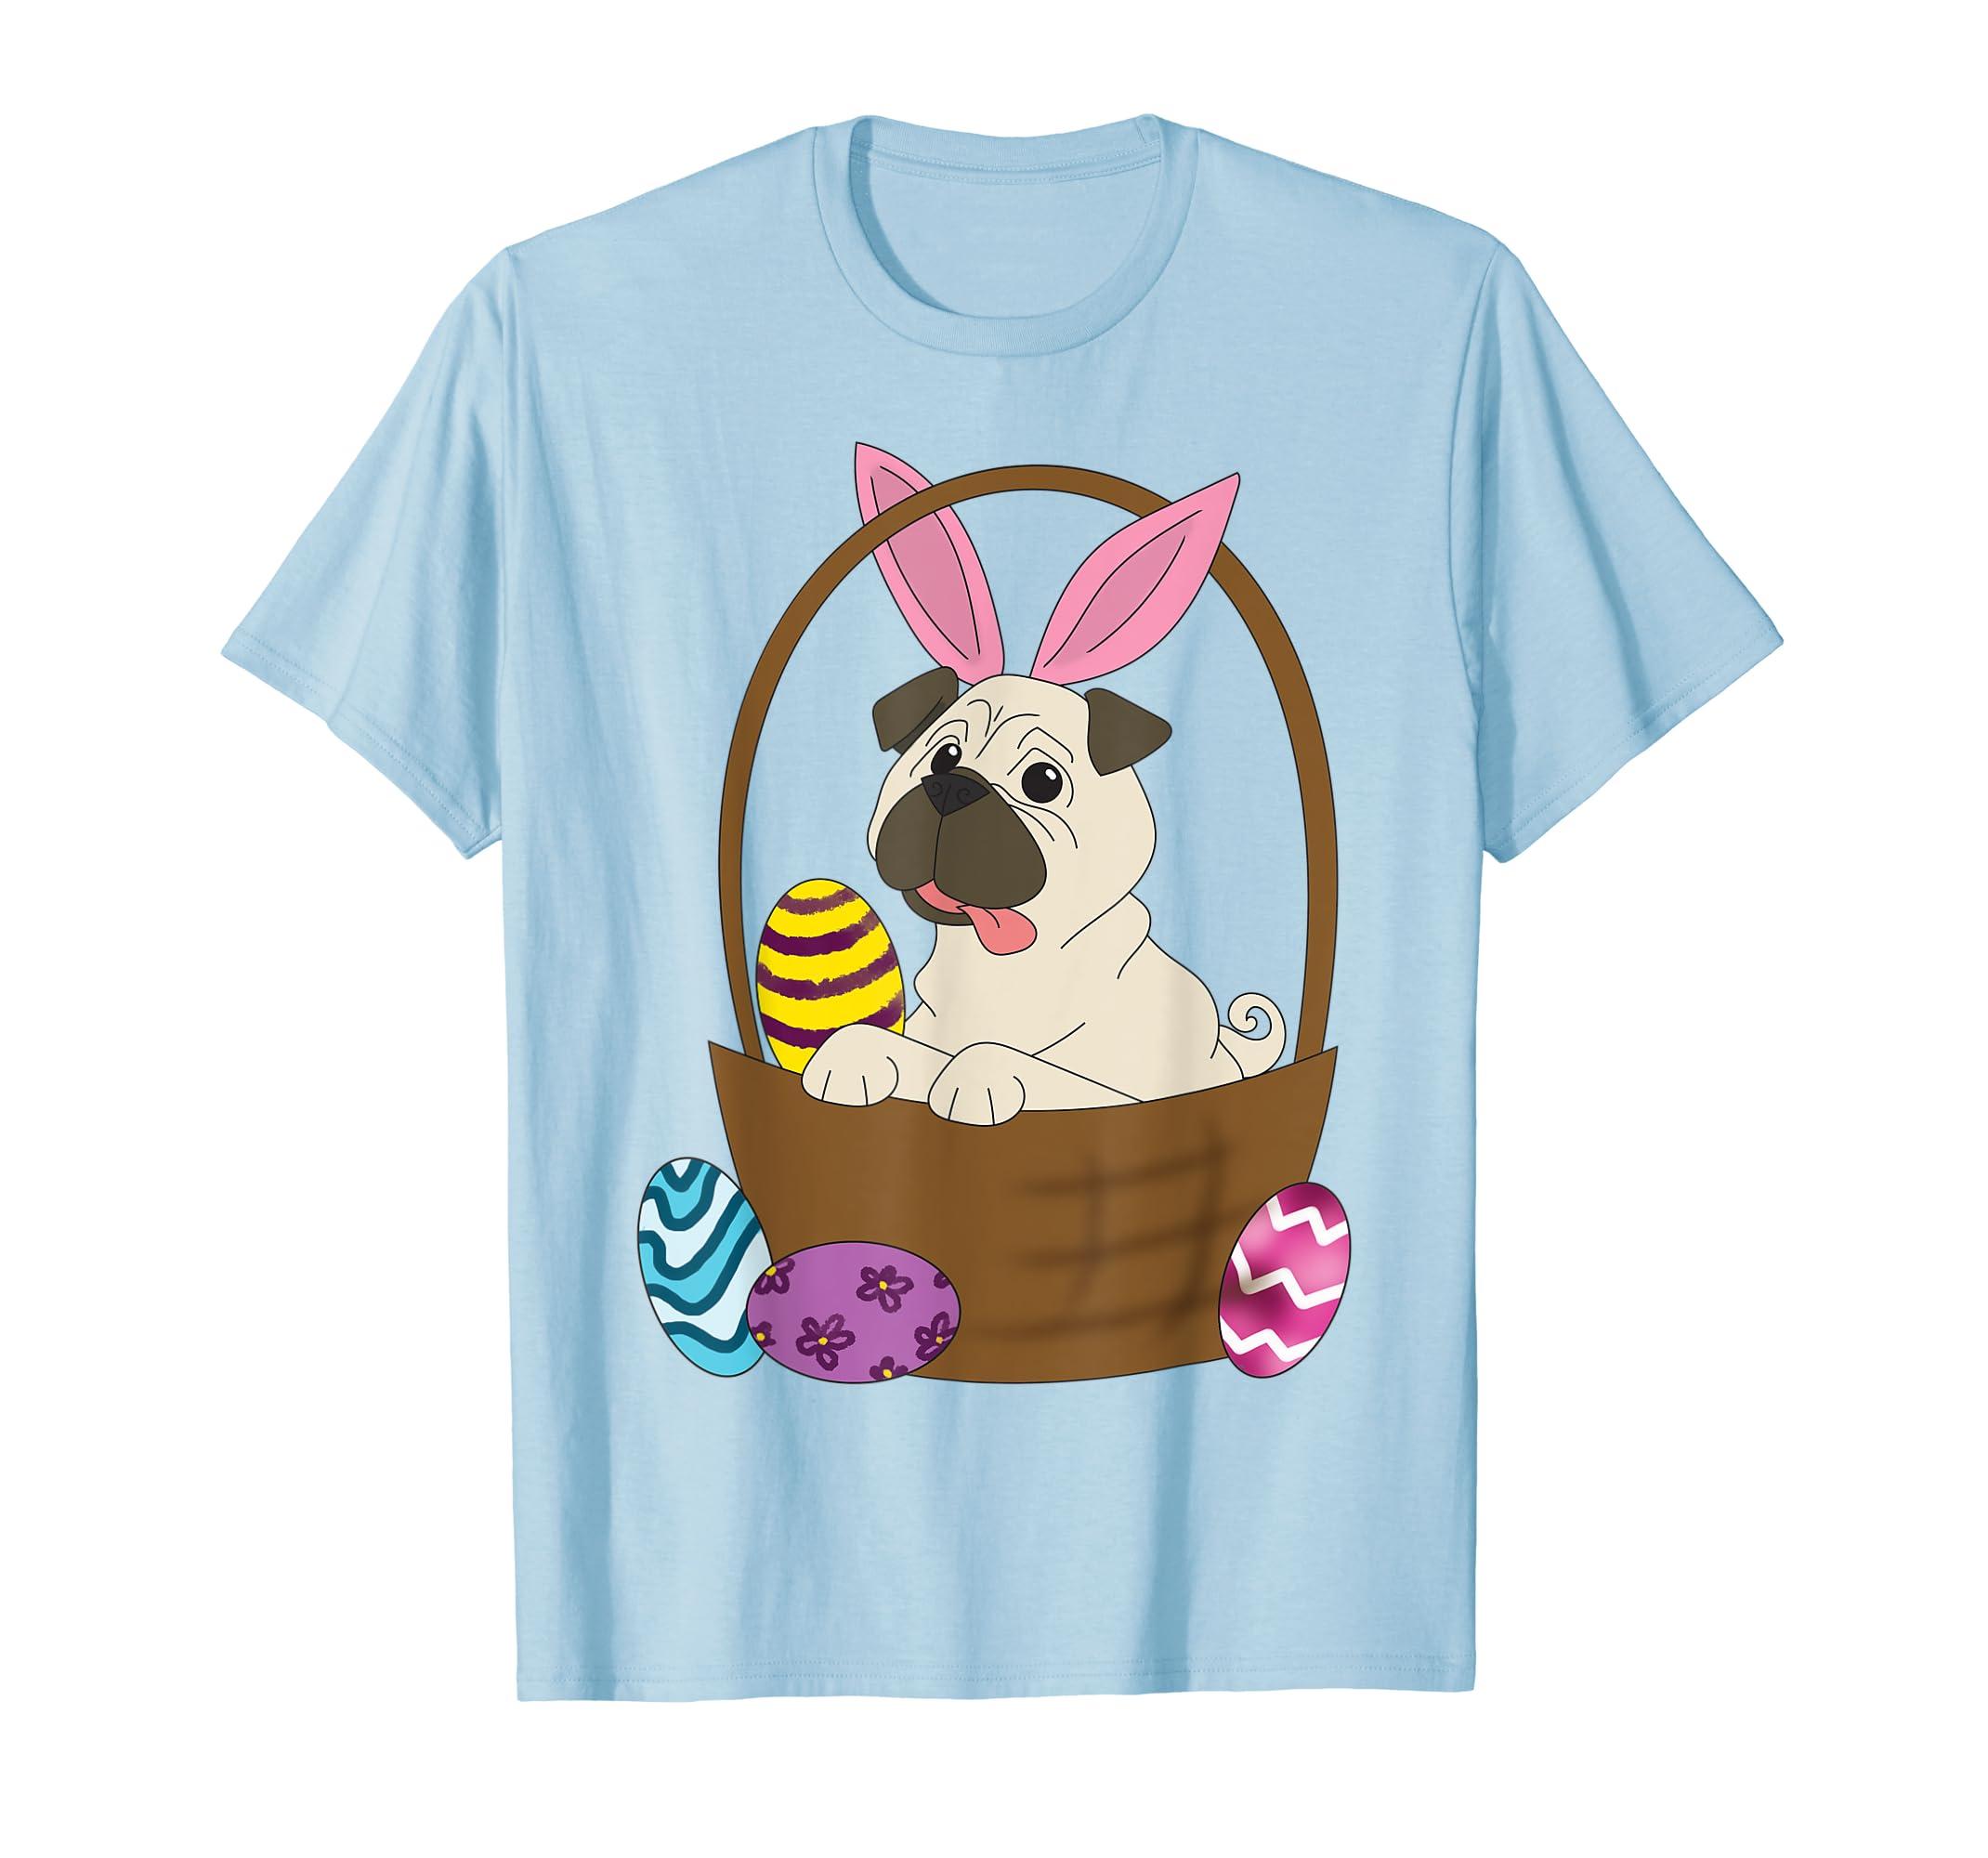 003b6d22145 Easter Pug in Basket Shirt for Pug Lovers